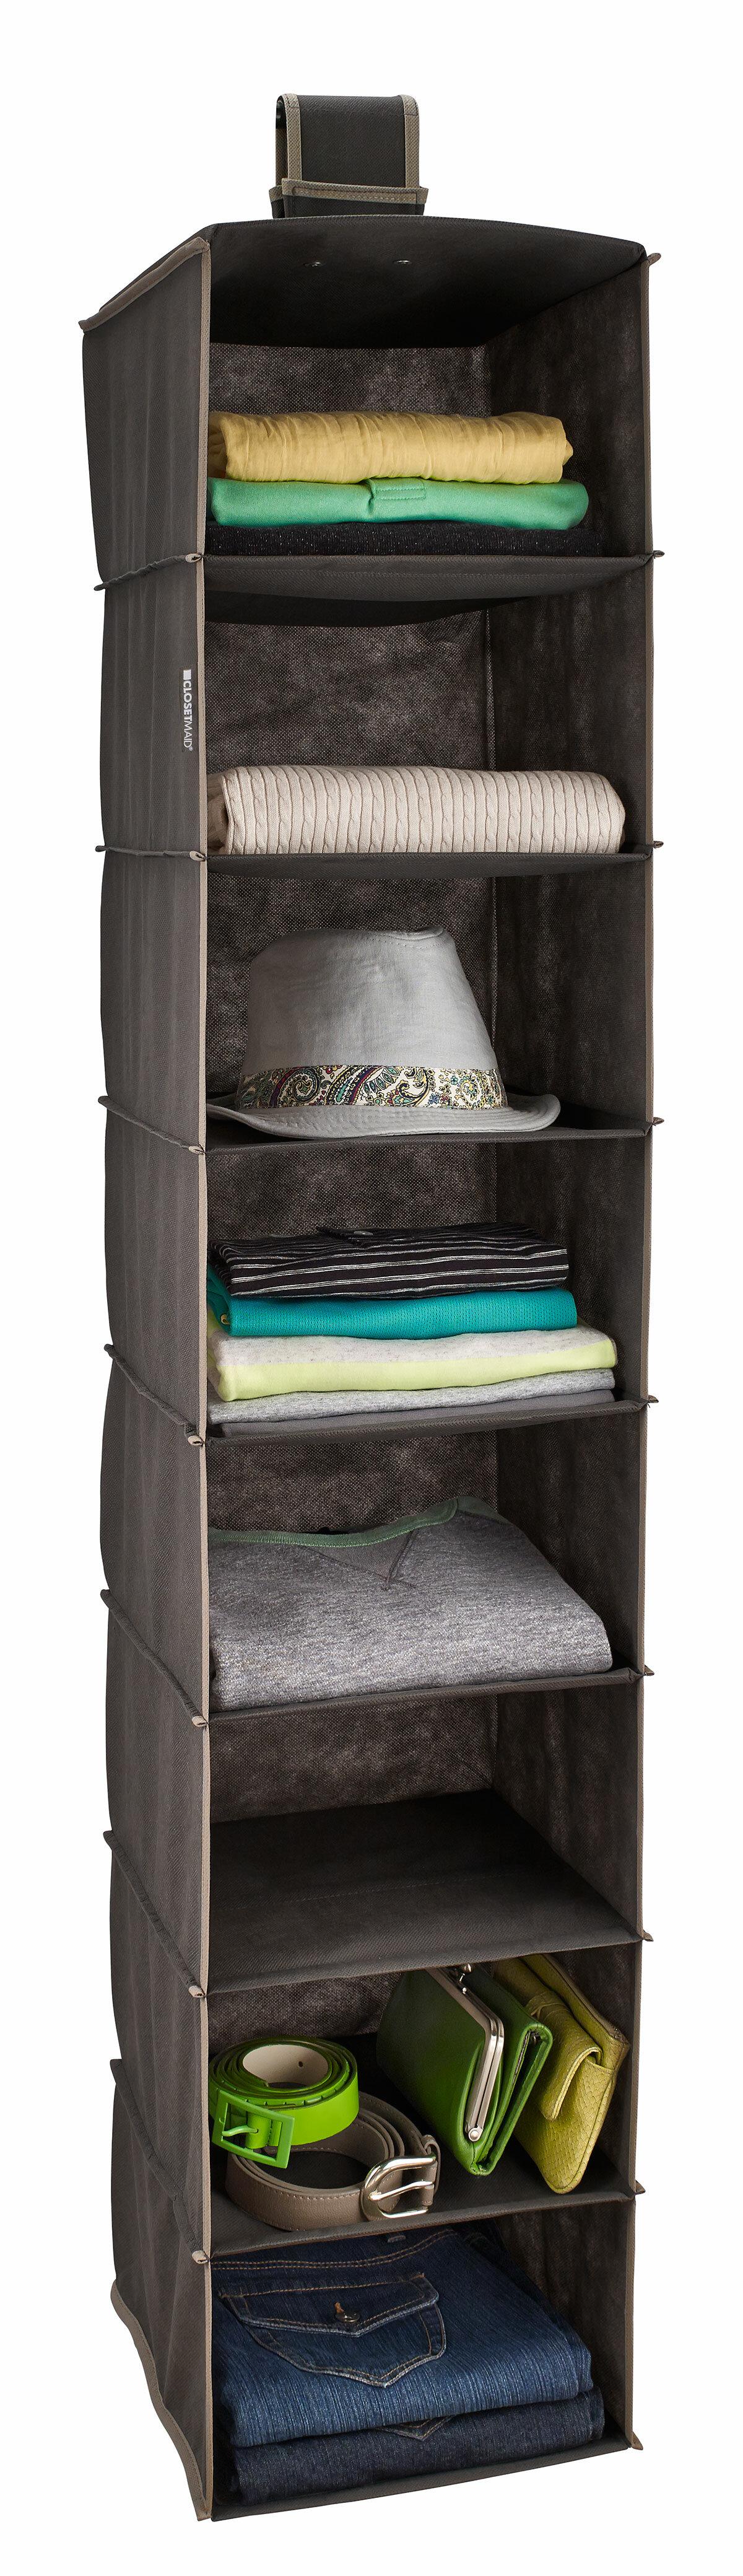 sweater them pin to display purse storage organizer for closet use idea boxes pursestorage